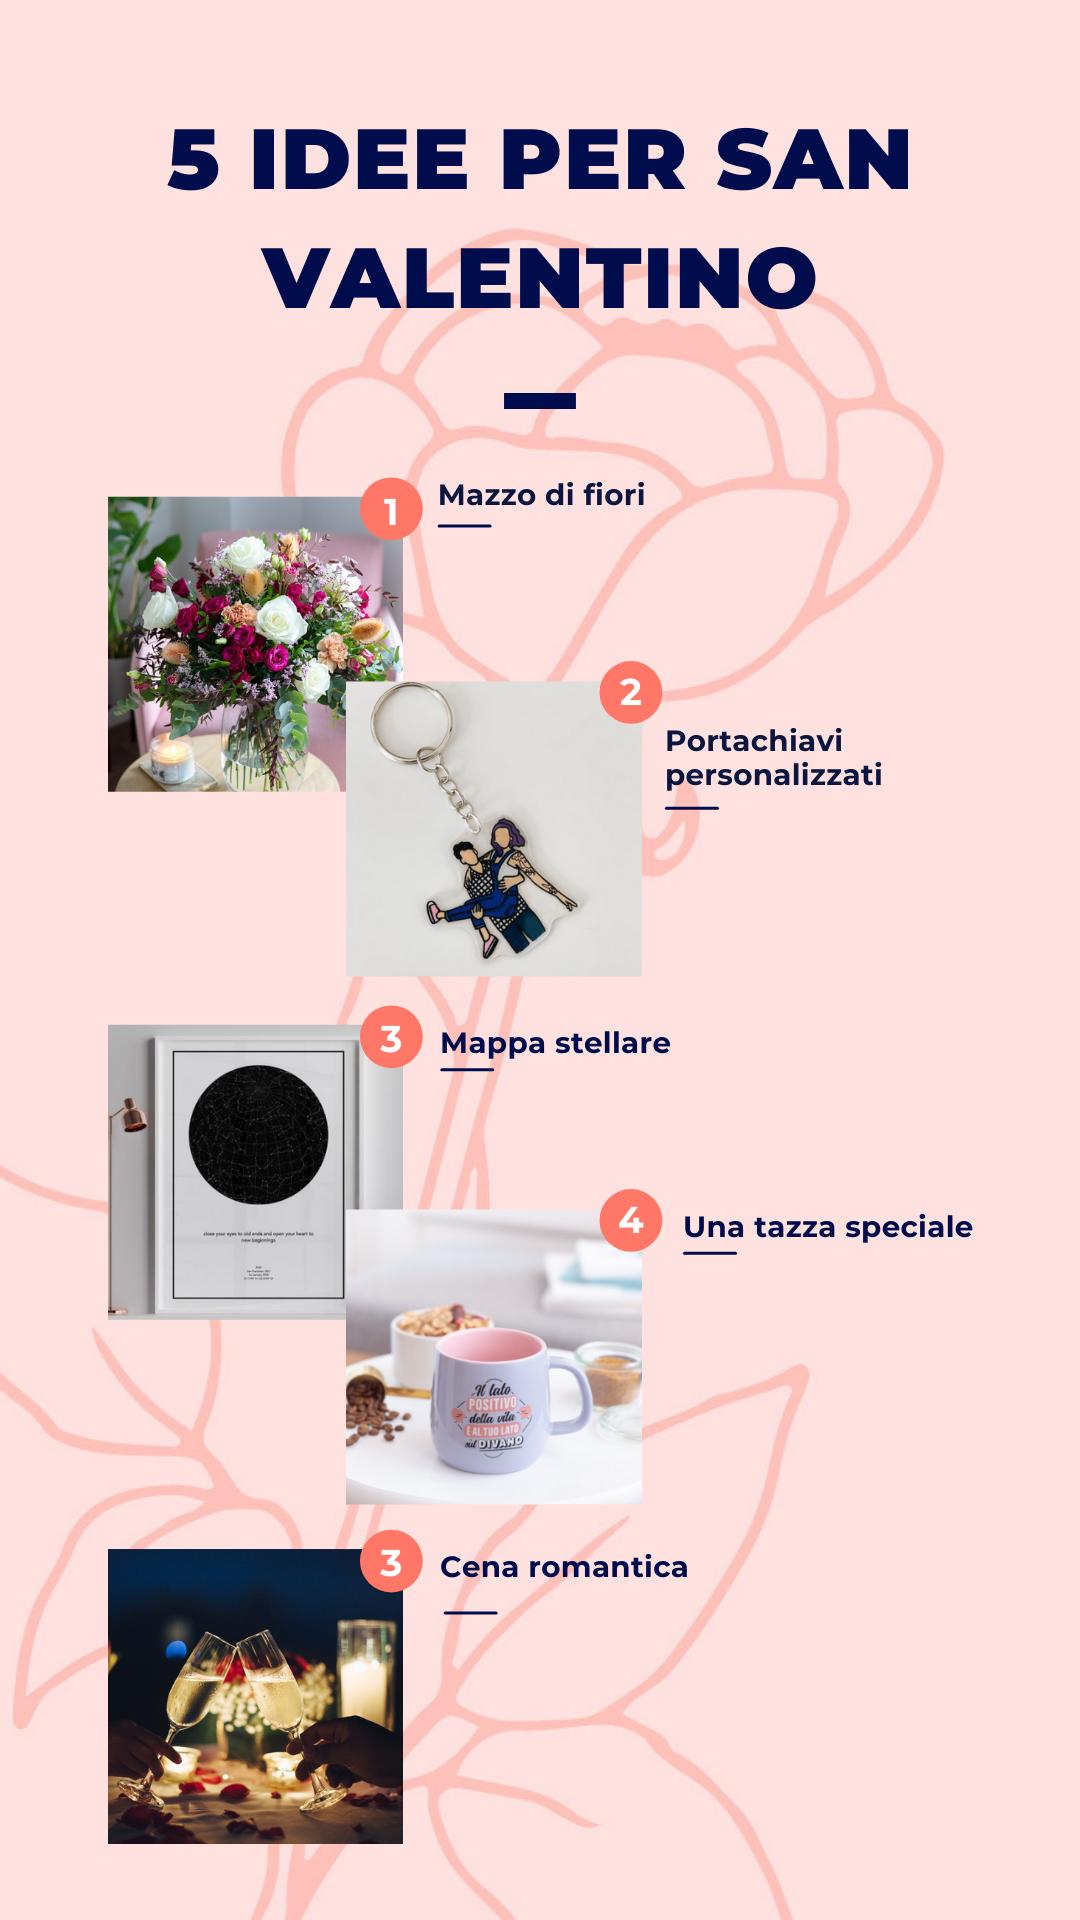 5 idee per san valentino